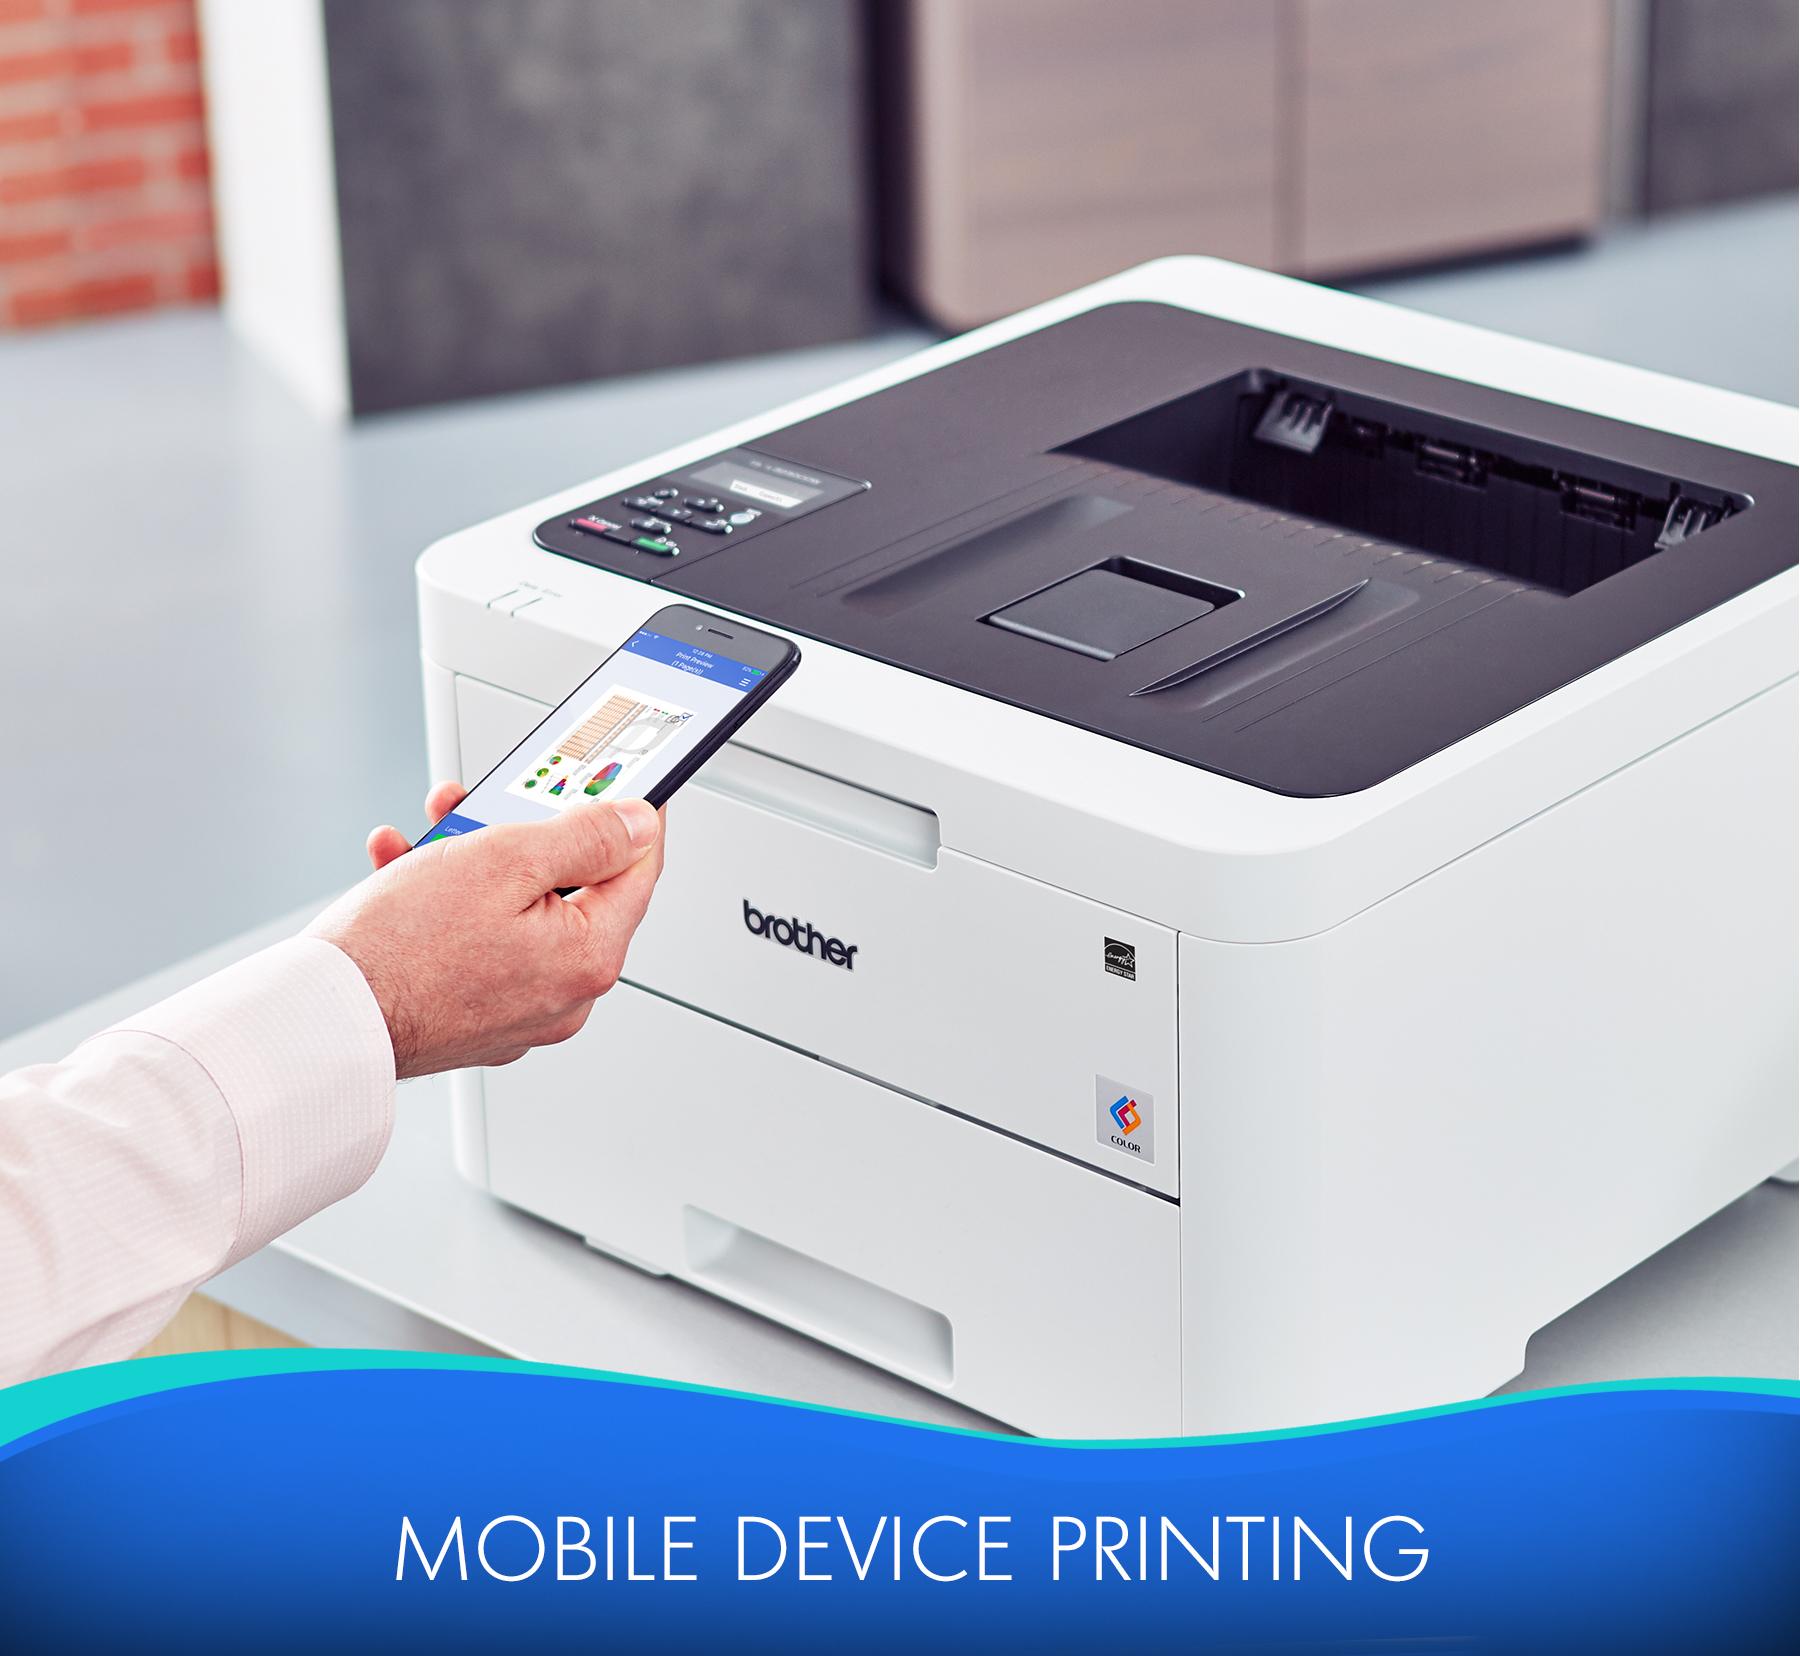 Brother HL-L3230CDW A4 Colour Laser Printer